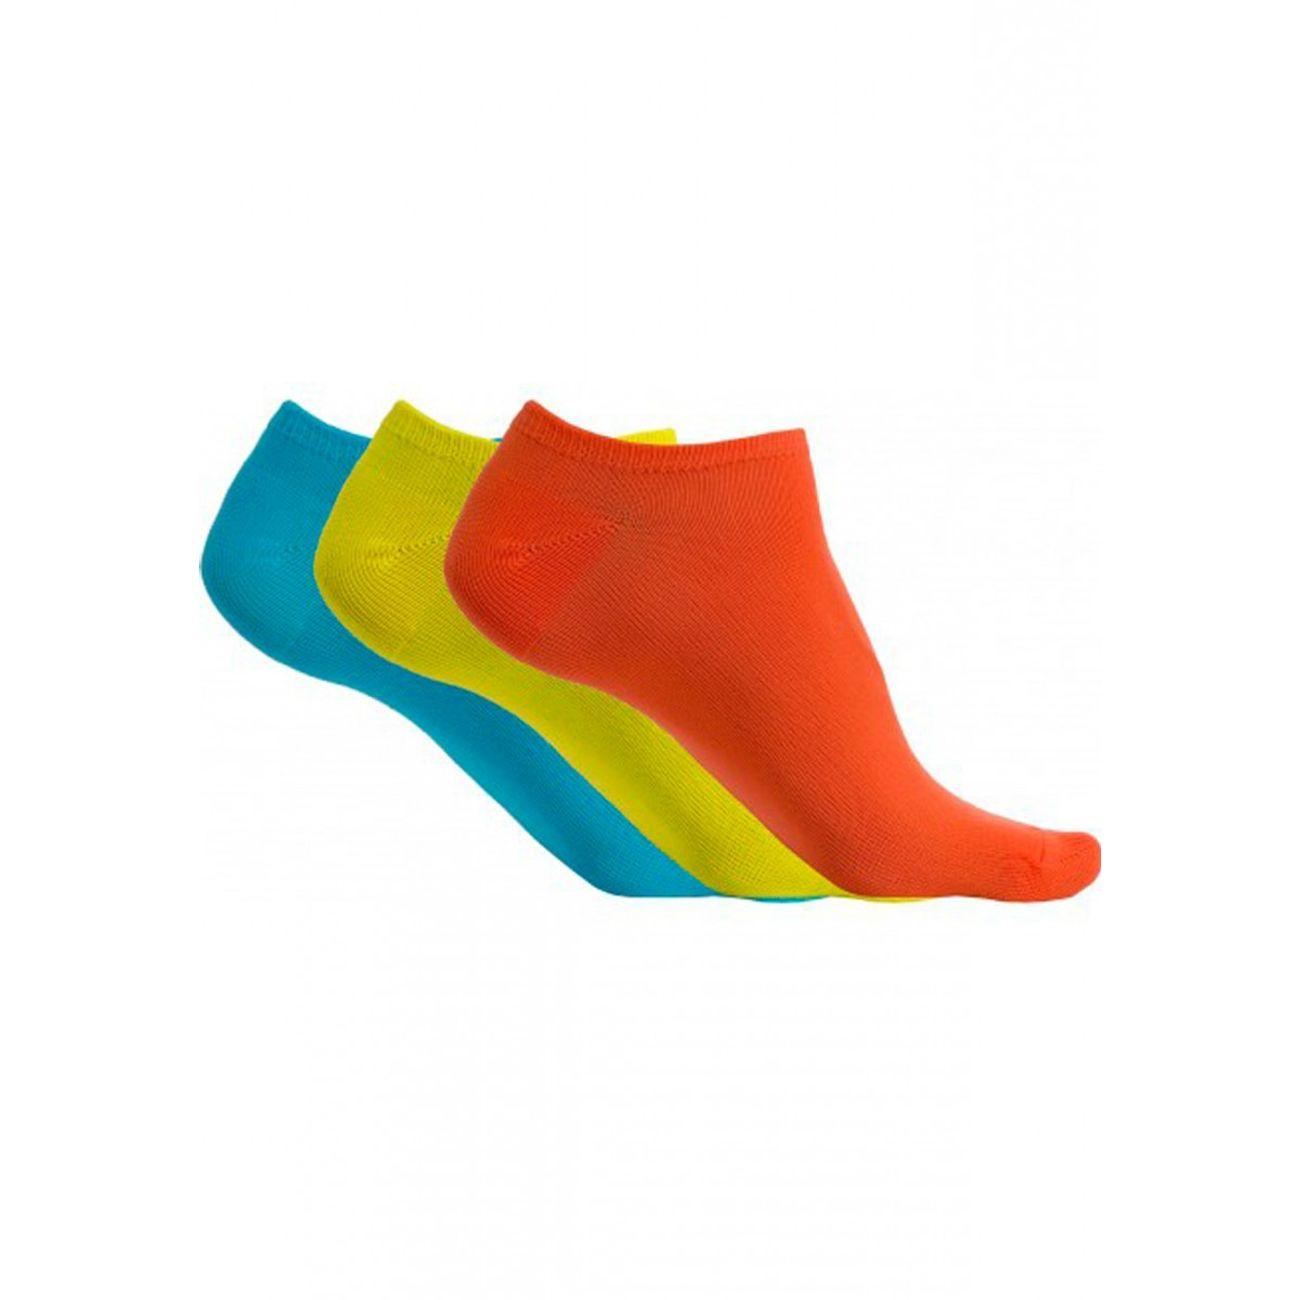 Bleu Homme Jaune ModeLifestyle 3 Paires Socquettes Pack MicrofibresPa033 Proact Orange Yy7gb6Ifvm